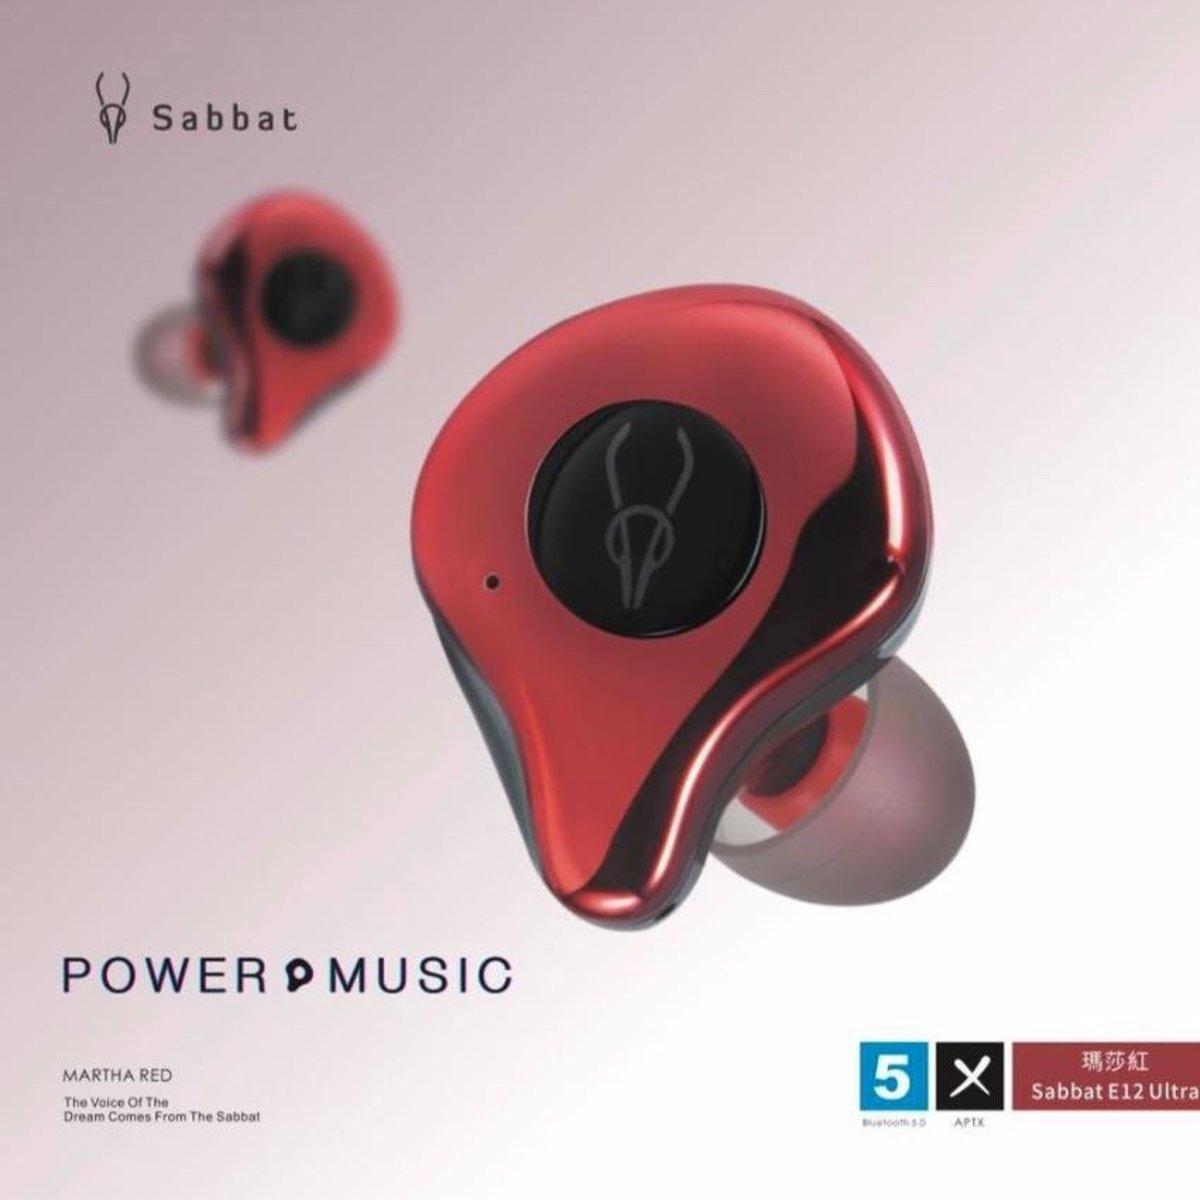 E12 Ultra True Wireless Qualcomm Bluetooth 5.0 aptX/AAC Stereo Earphones[Marthc Red]